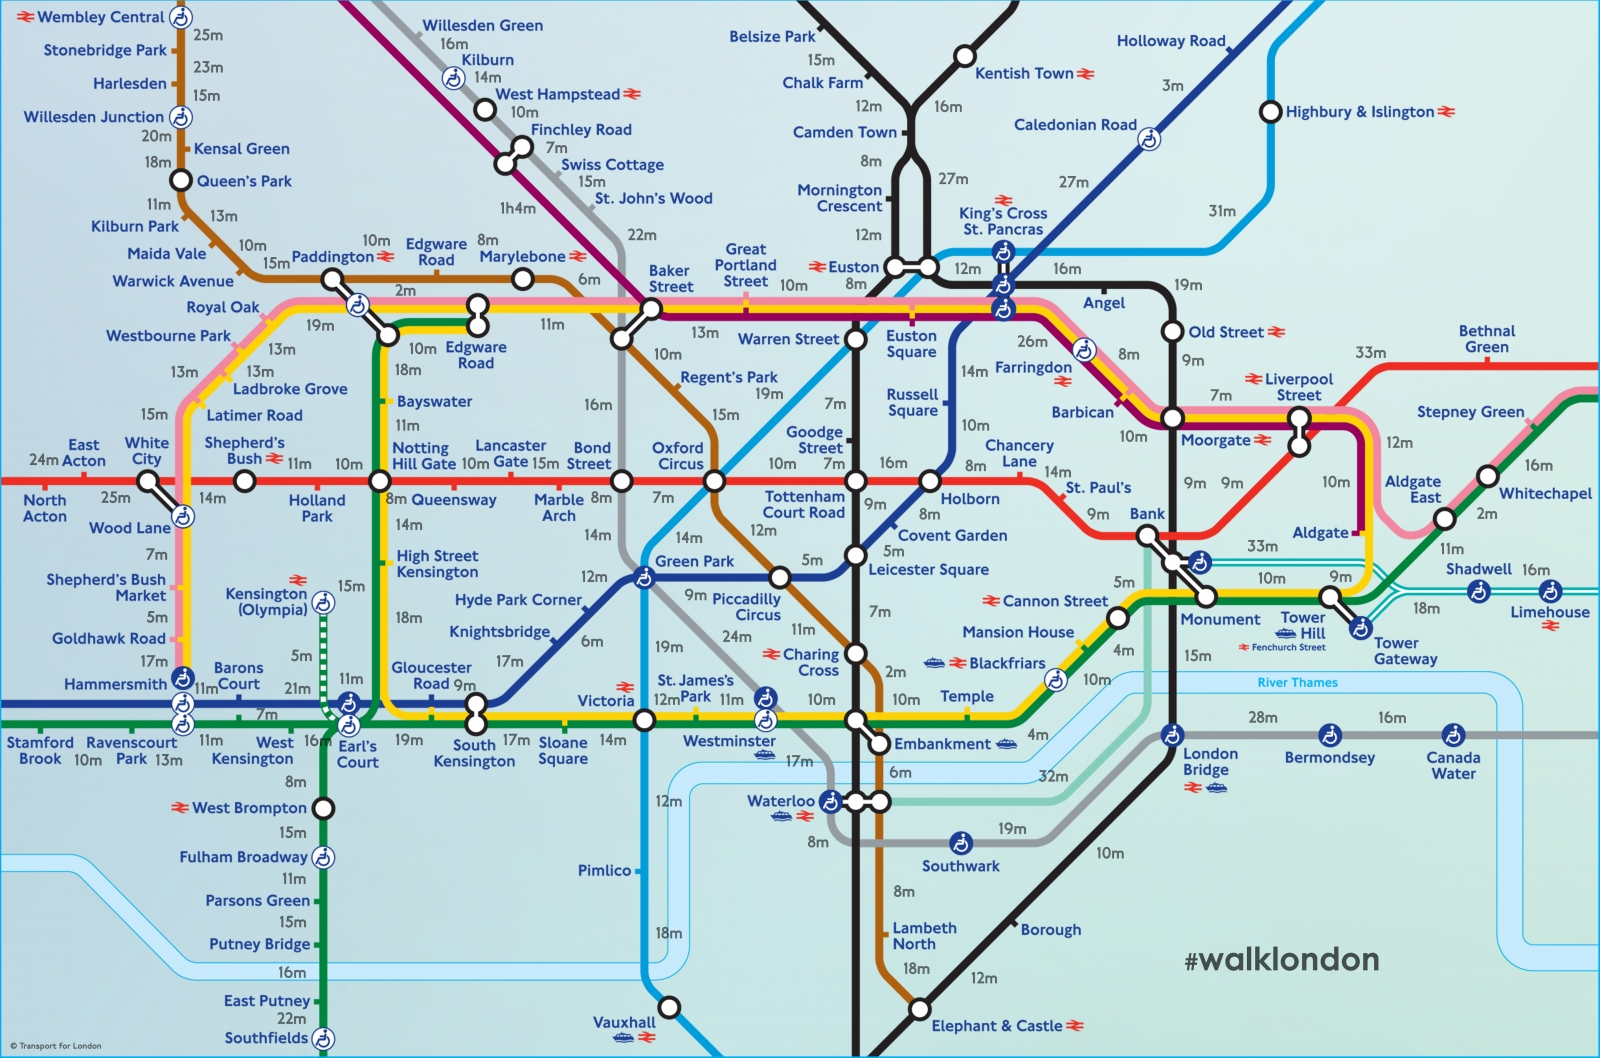 Tube Strike Walking Times Between London Underground Stations